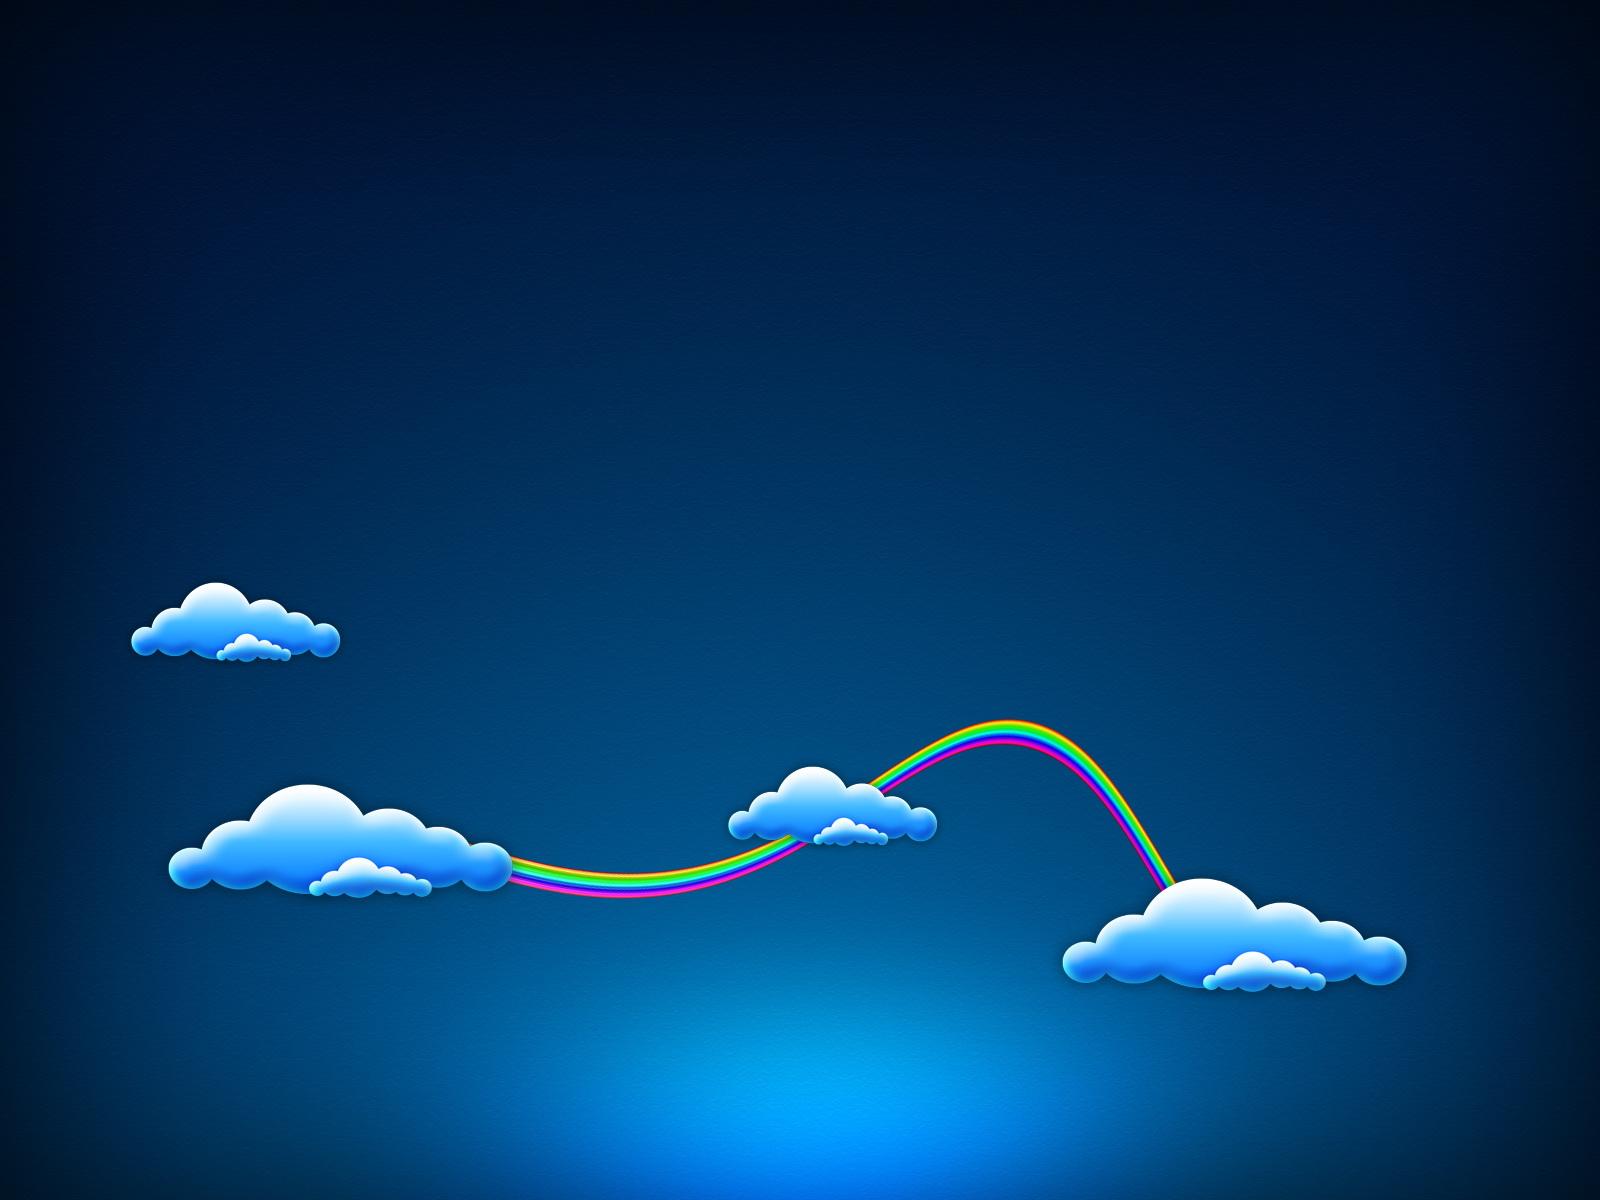 http://2.bp.blogspot.com/-M7NGNSarRAE/T4mgb3RtCpI/AAAAAAAADNI/T5SuSldJ0kY/s1600/blue_sky_clouds-normal.jpg